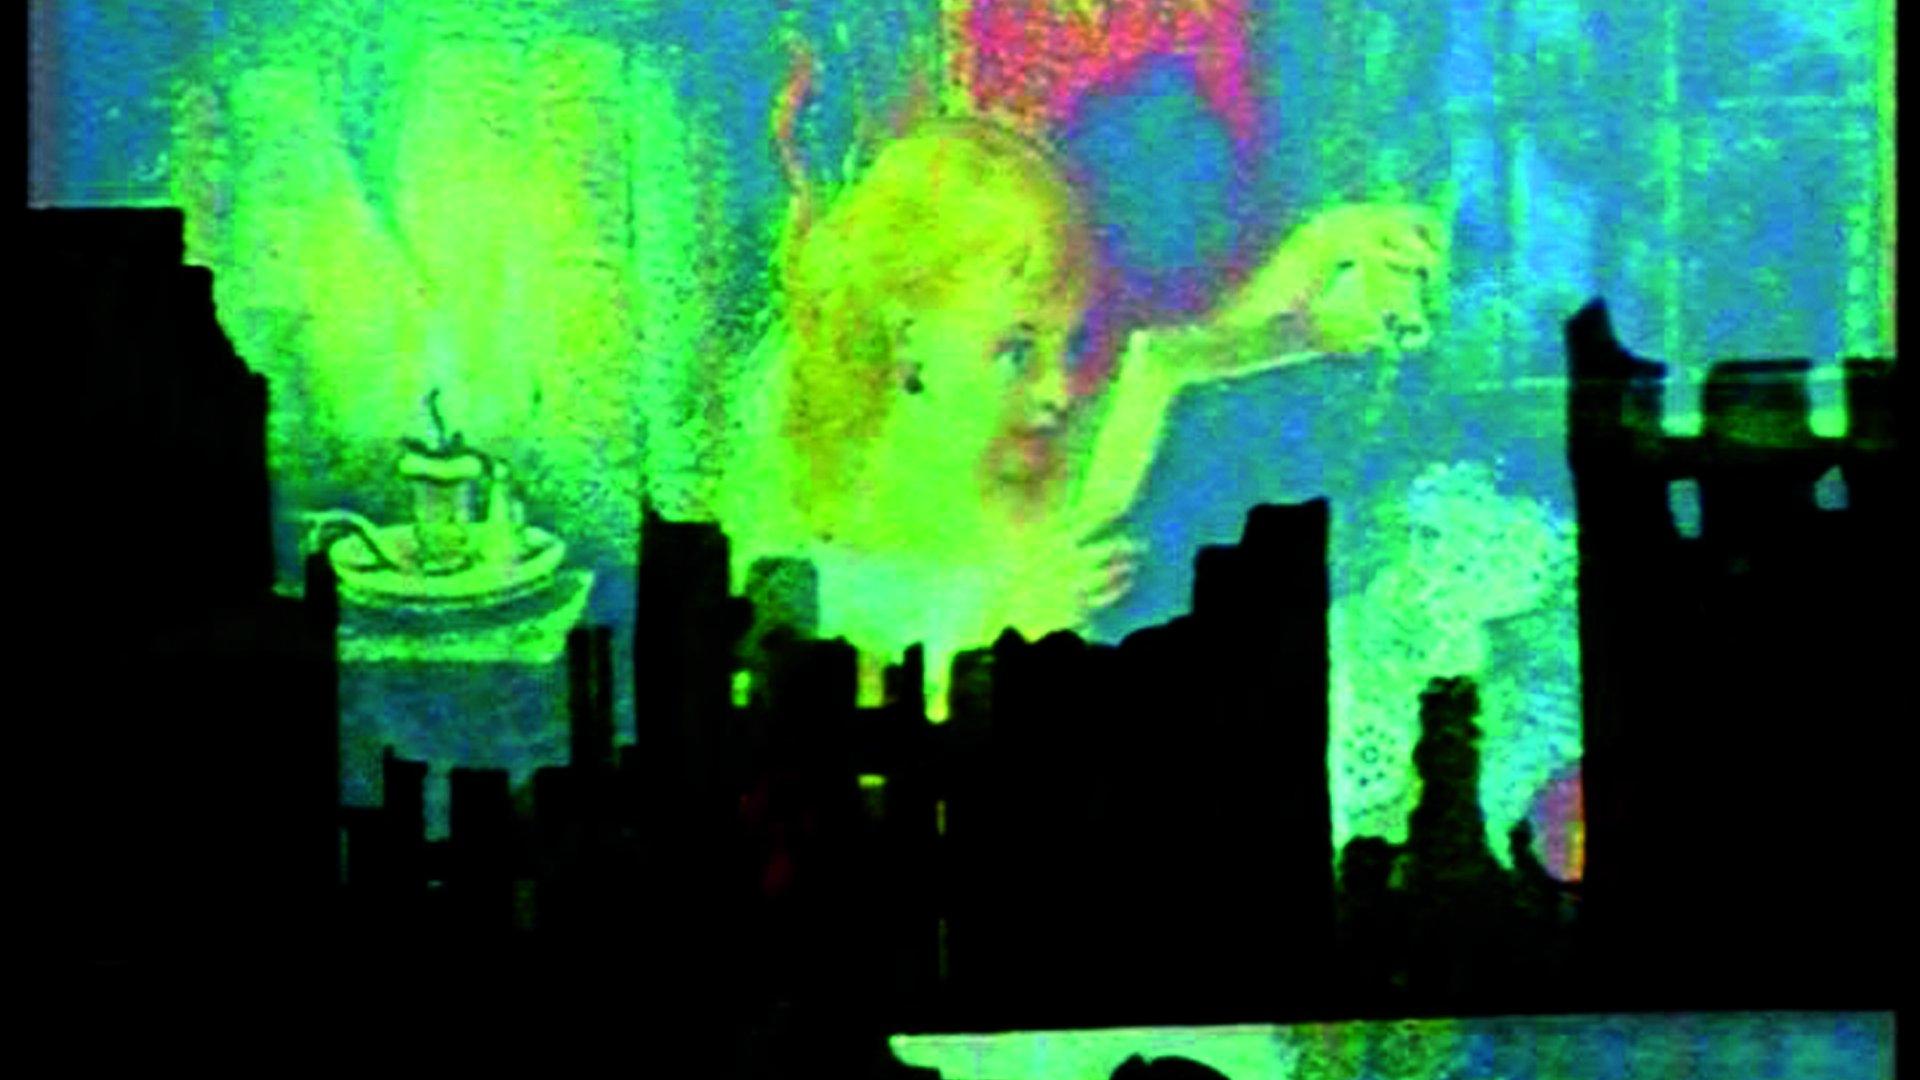 http://indieethos.files.wordpress.com/2011/06/film-socialisme-still-3-image-courtesy-of-wild-bunch.jpeg